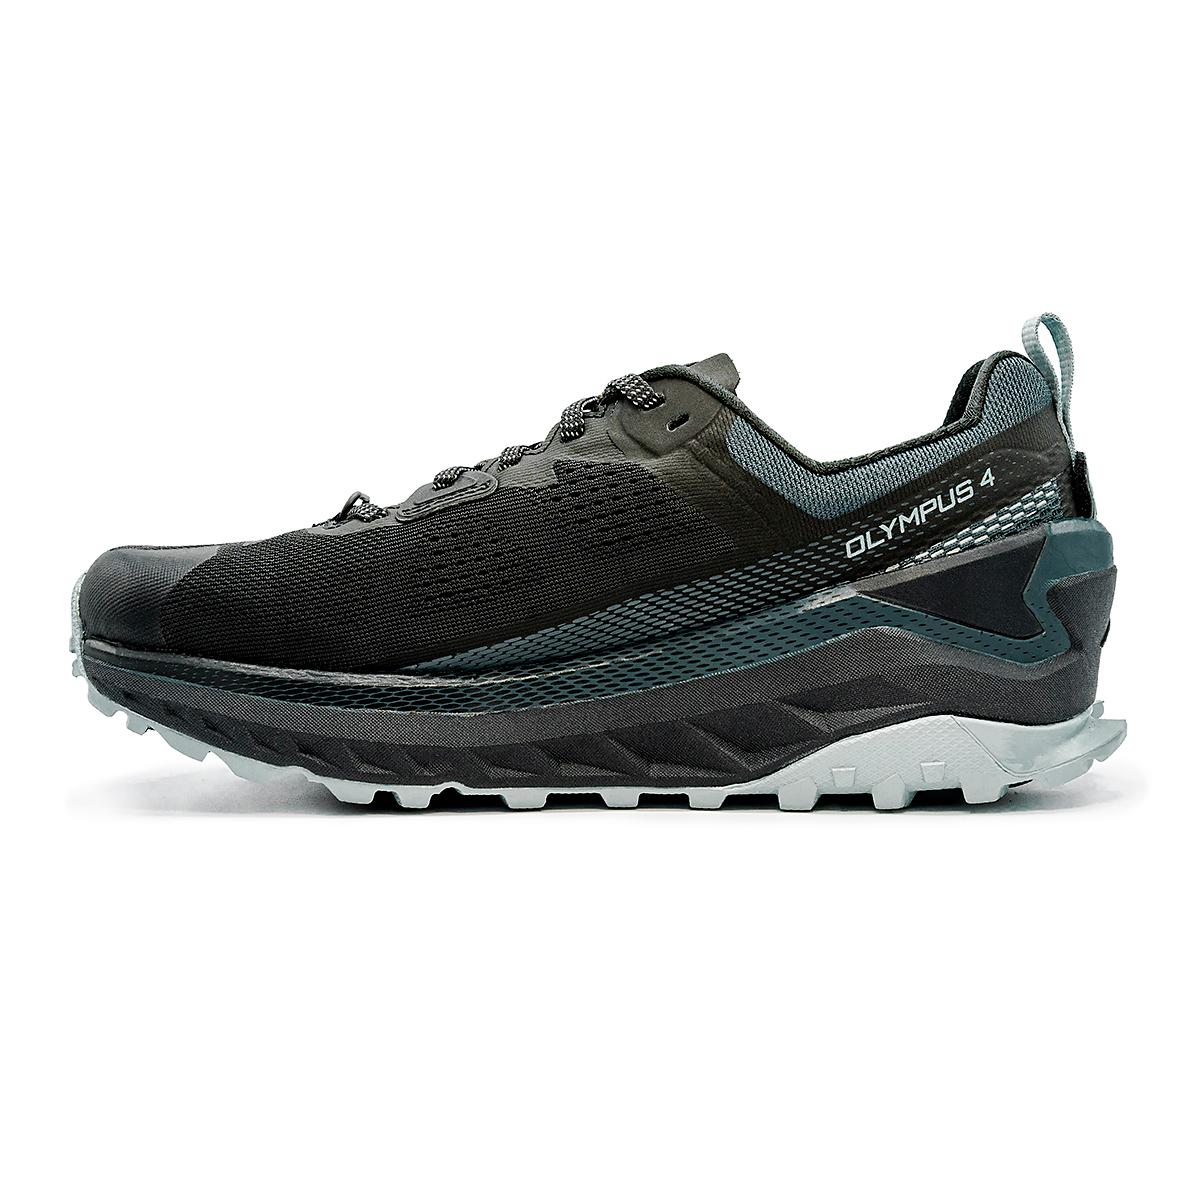 Women's Altra Olympus 4 Trail Running Shoe - Color: Black/Light Blue - Size: 5.5 - Width: Regular, Black/Light Blue, large, image 2